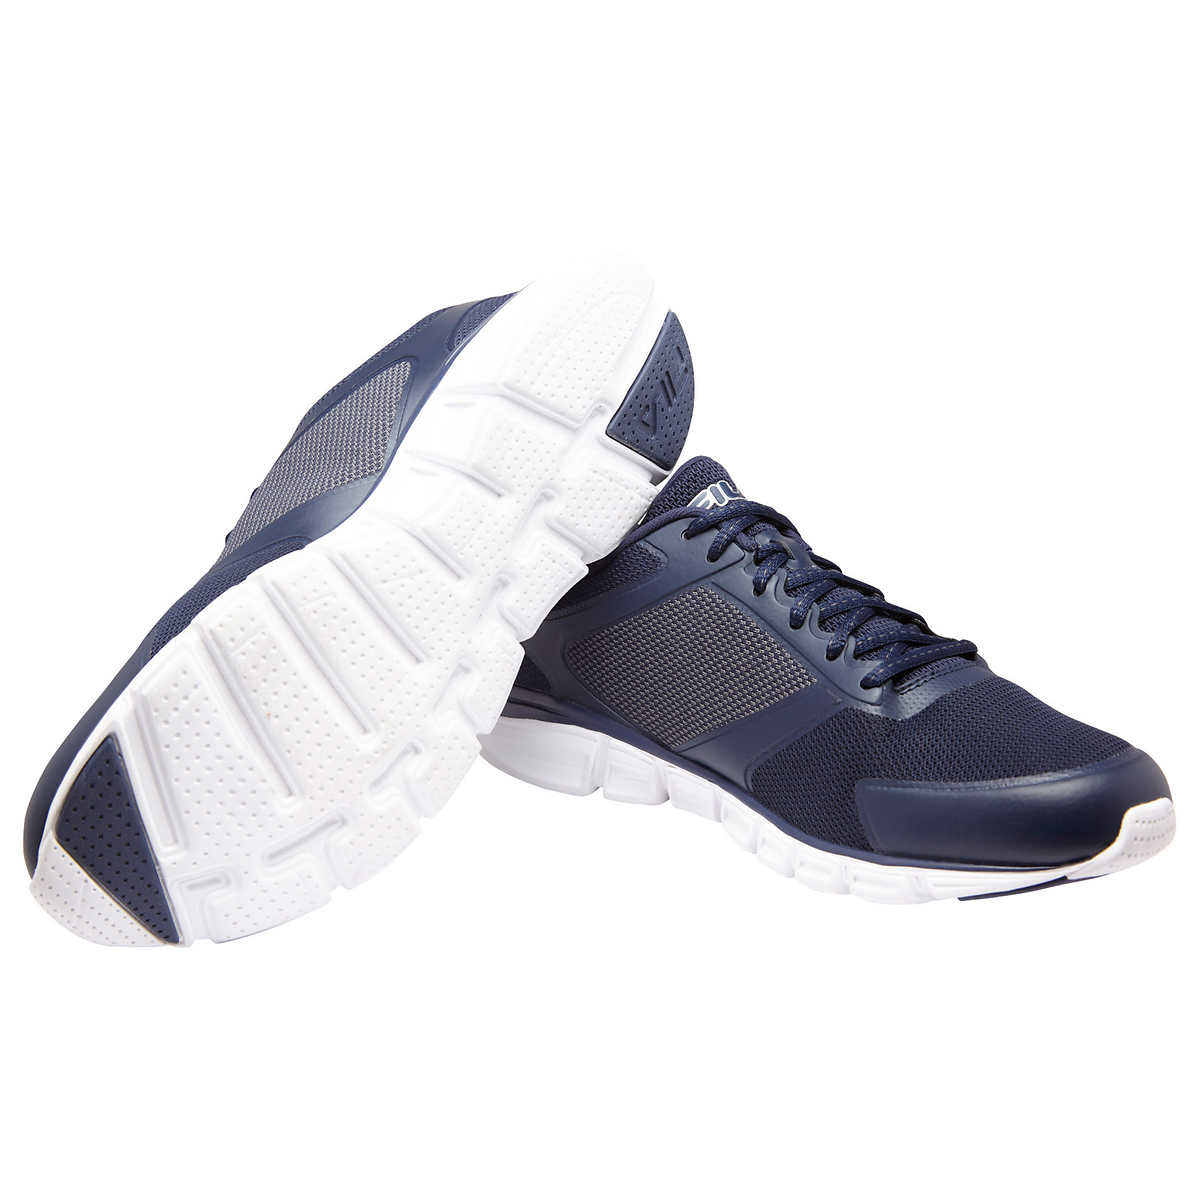 26441a1f1c0e fila - fila men s memory foam steelsprint athletic shoes (black ...